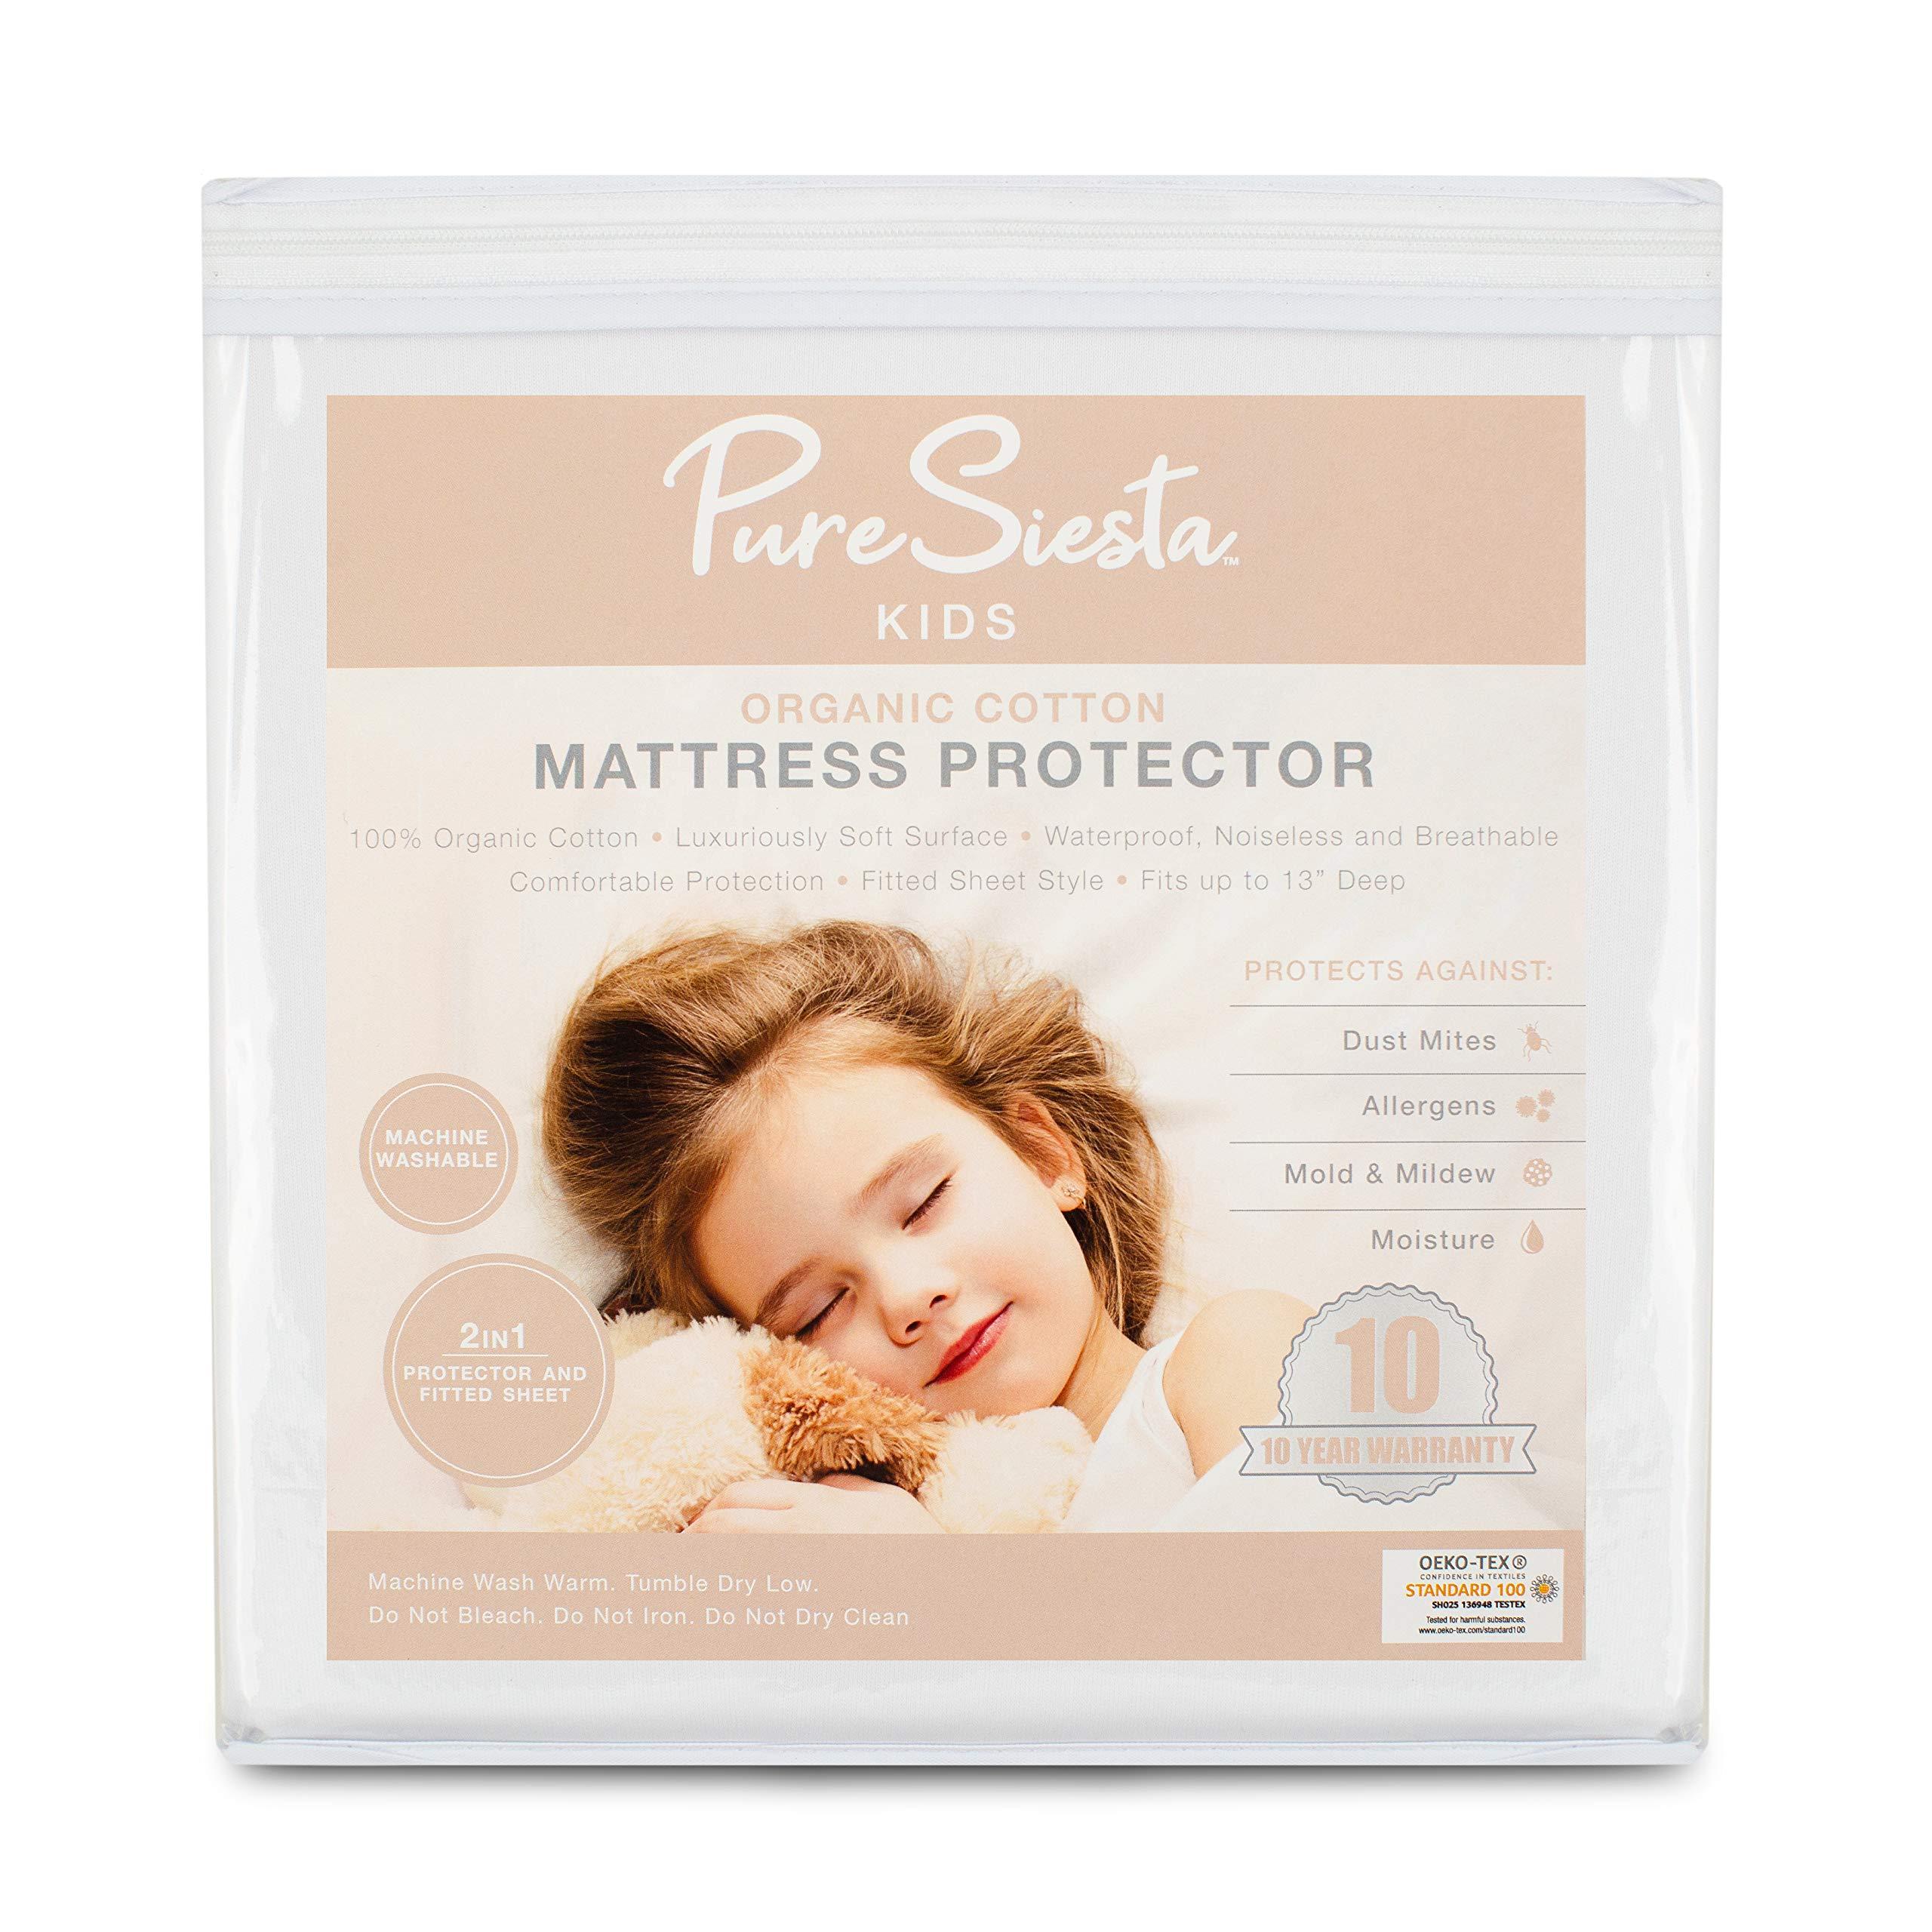 PURE SIESTA Kids 100% Organic Cotton Sheet Organic Mattress Cover Protective Mattress Cover Waterproof Mattress Pad Zipper Bed Bug Protector Hypoallergenic Non-Toxic 10 Year Warranty (Twin)